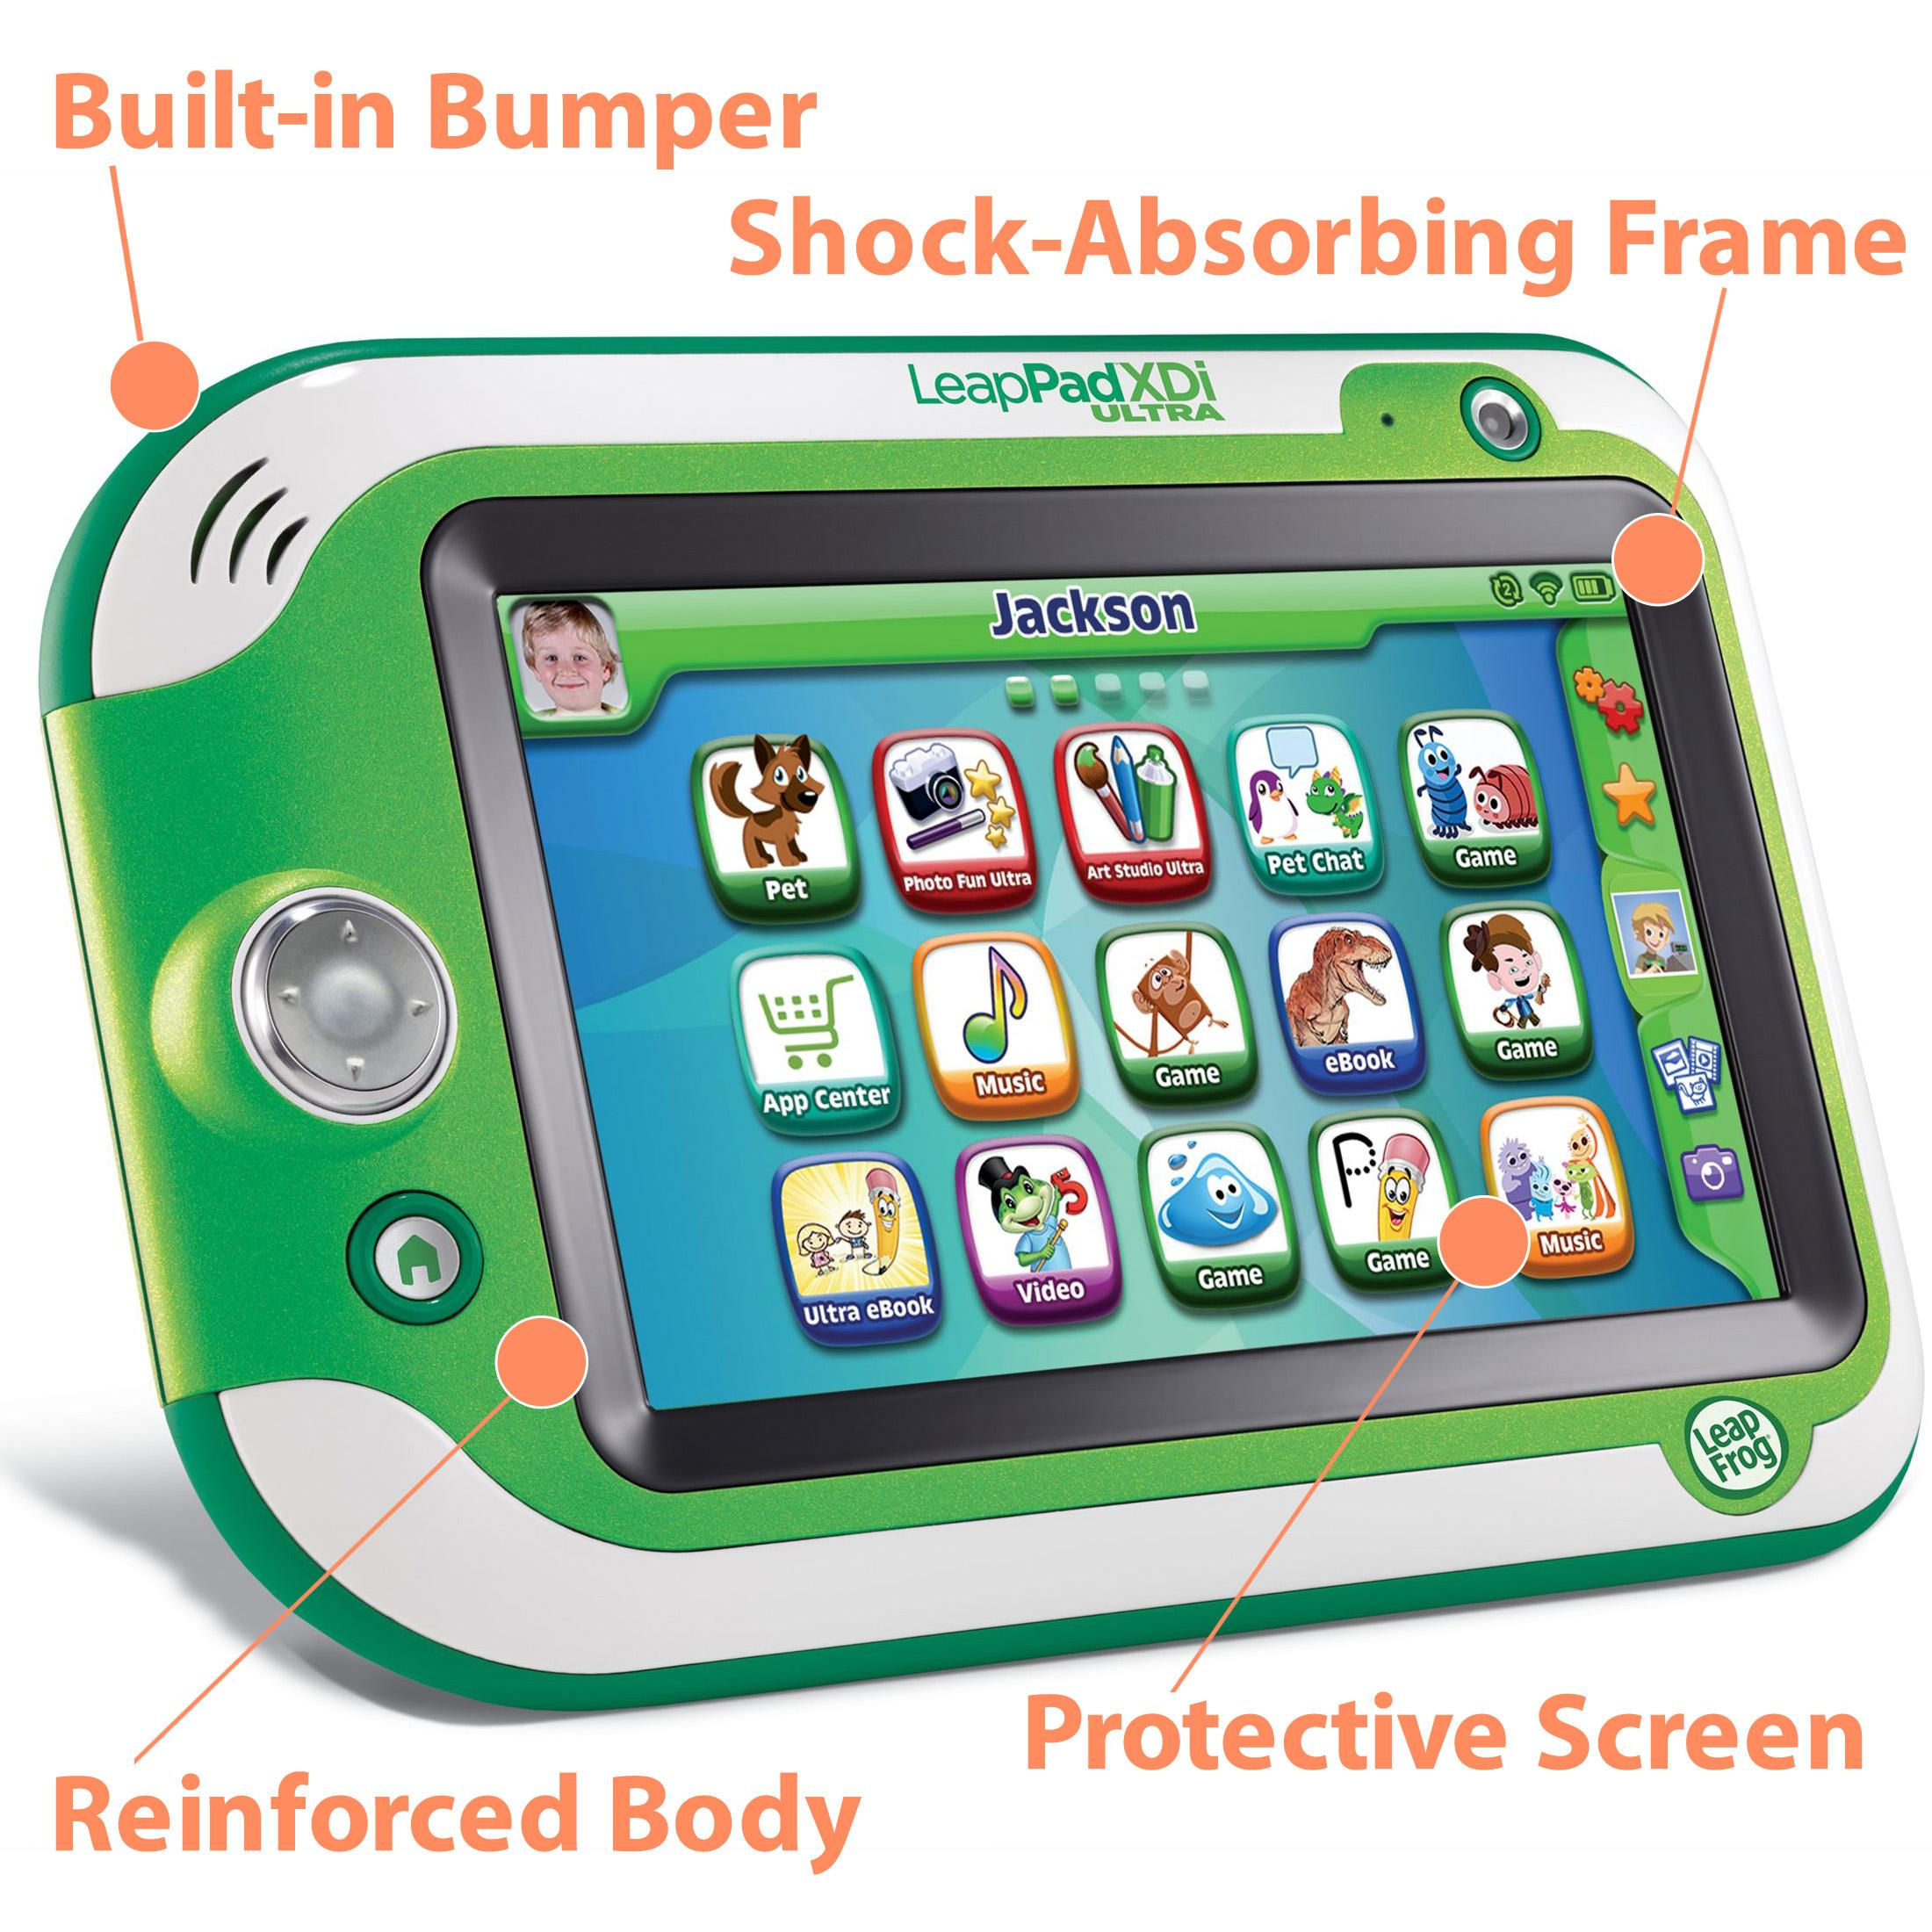 LeapFrog LeapPad Ultra XDI Kids Tablet - Best Reviews Tablet